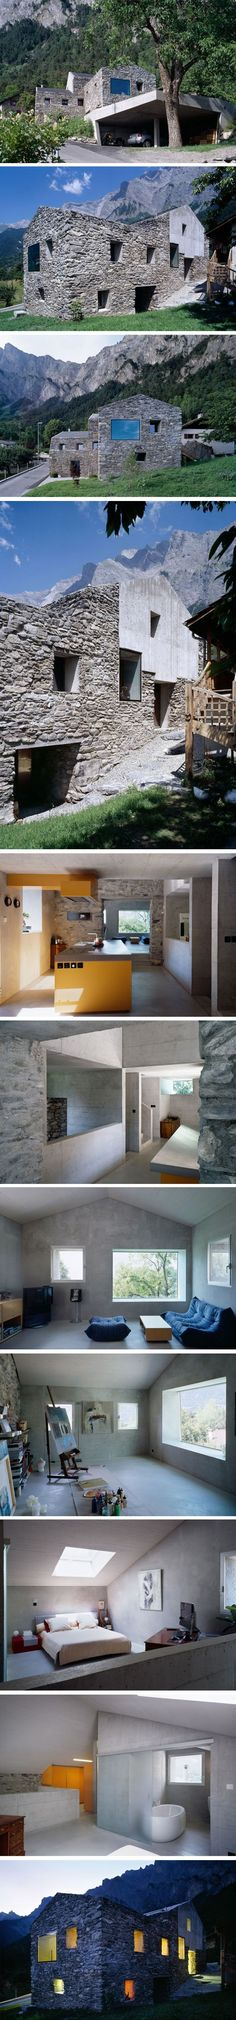 Rénovation à Chamoson par Savioz Fabrizzi Architecte